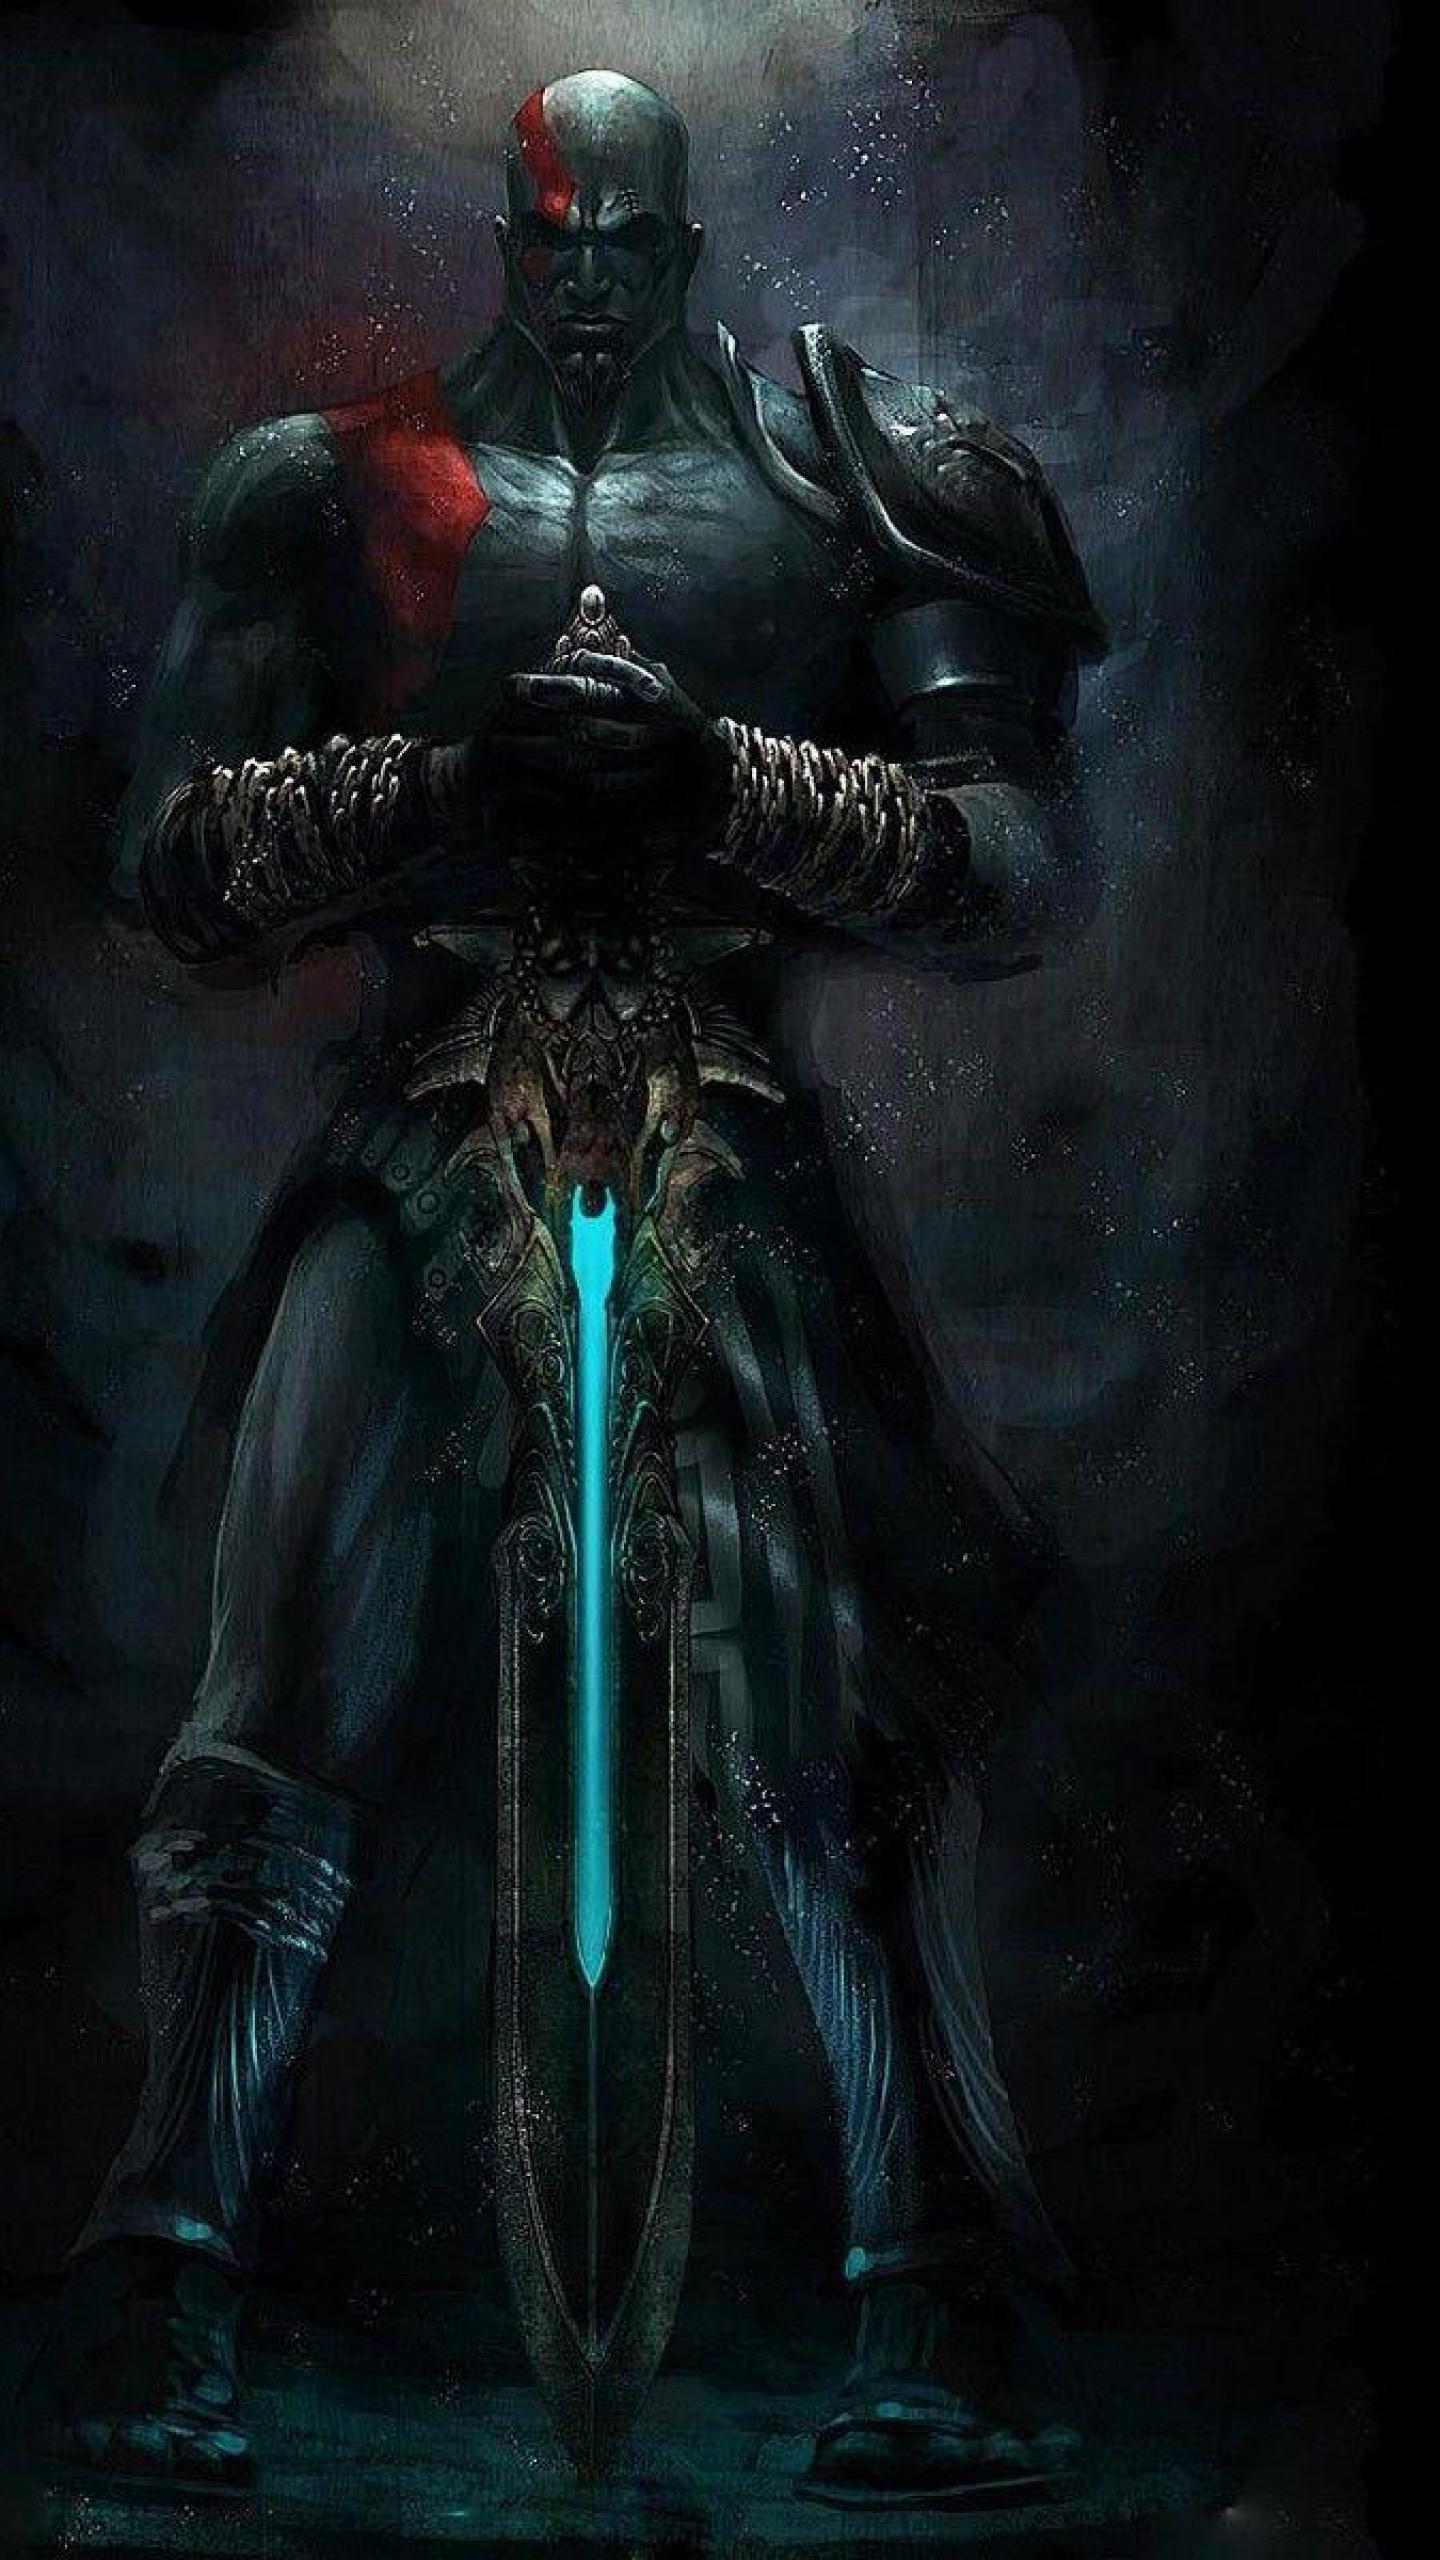 Free Download God Kratos Games Kratos God Of War Of War Hd